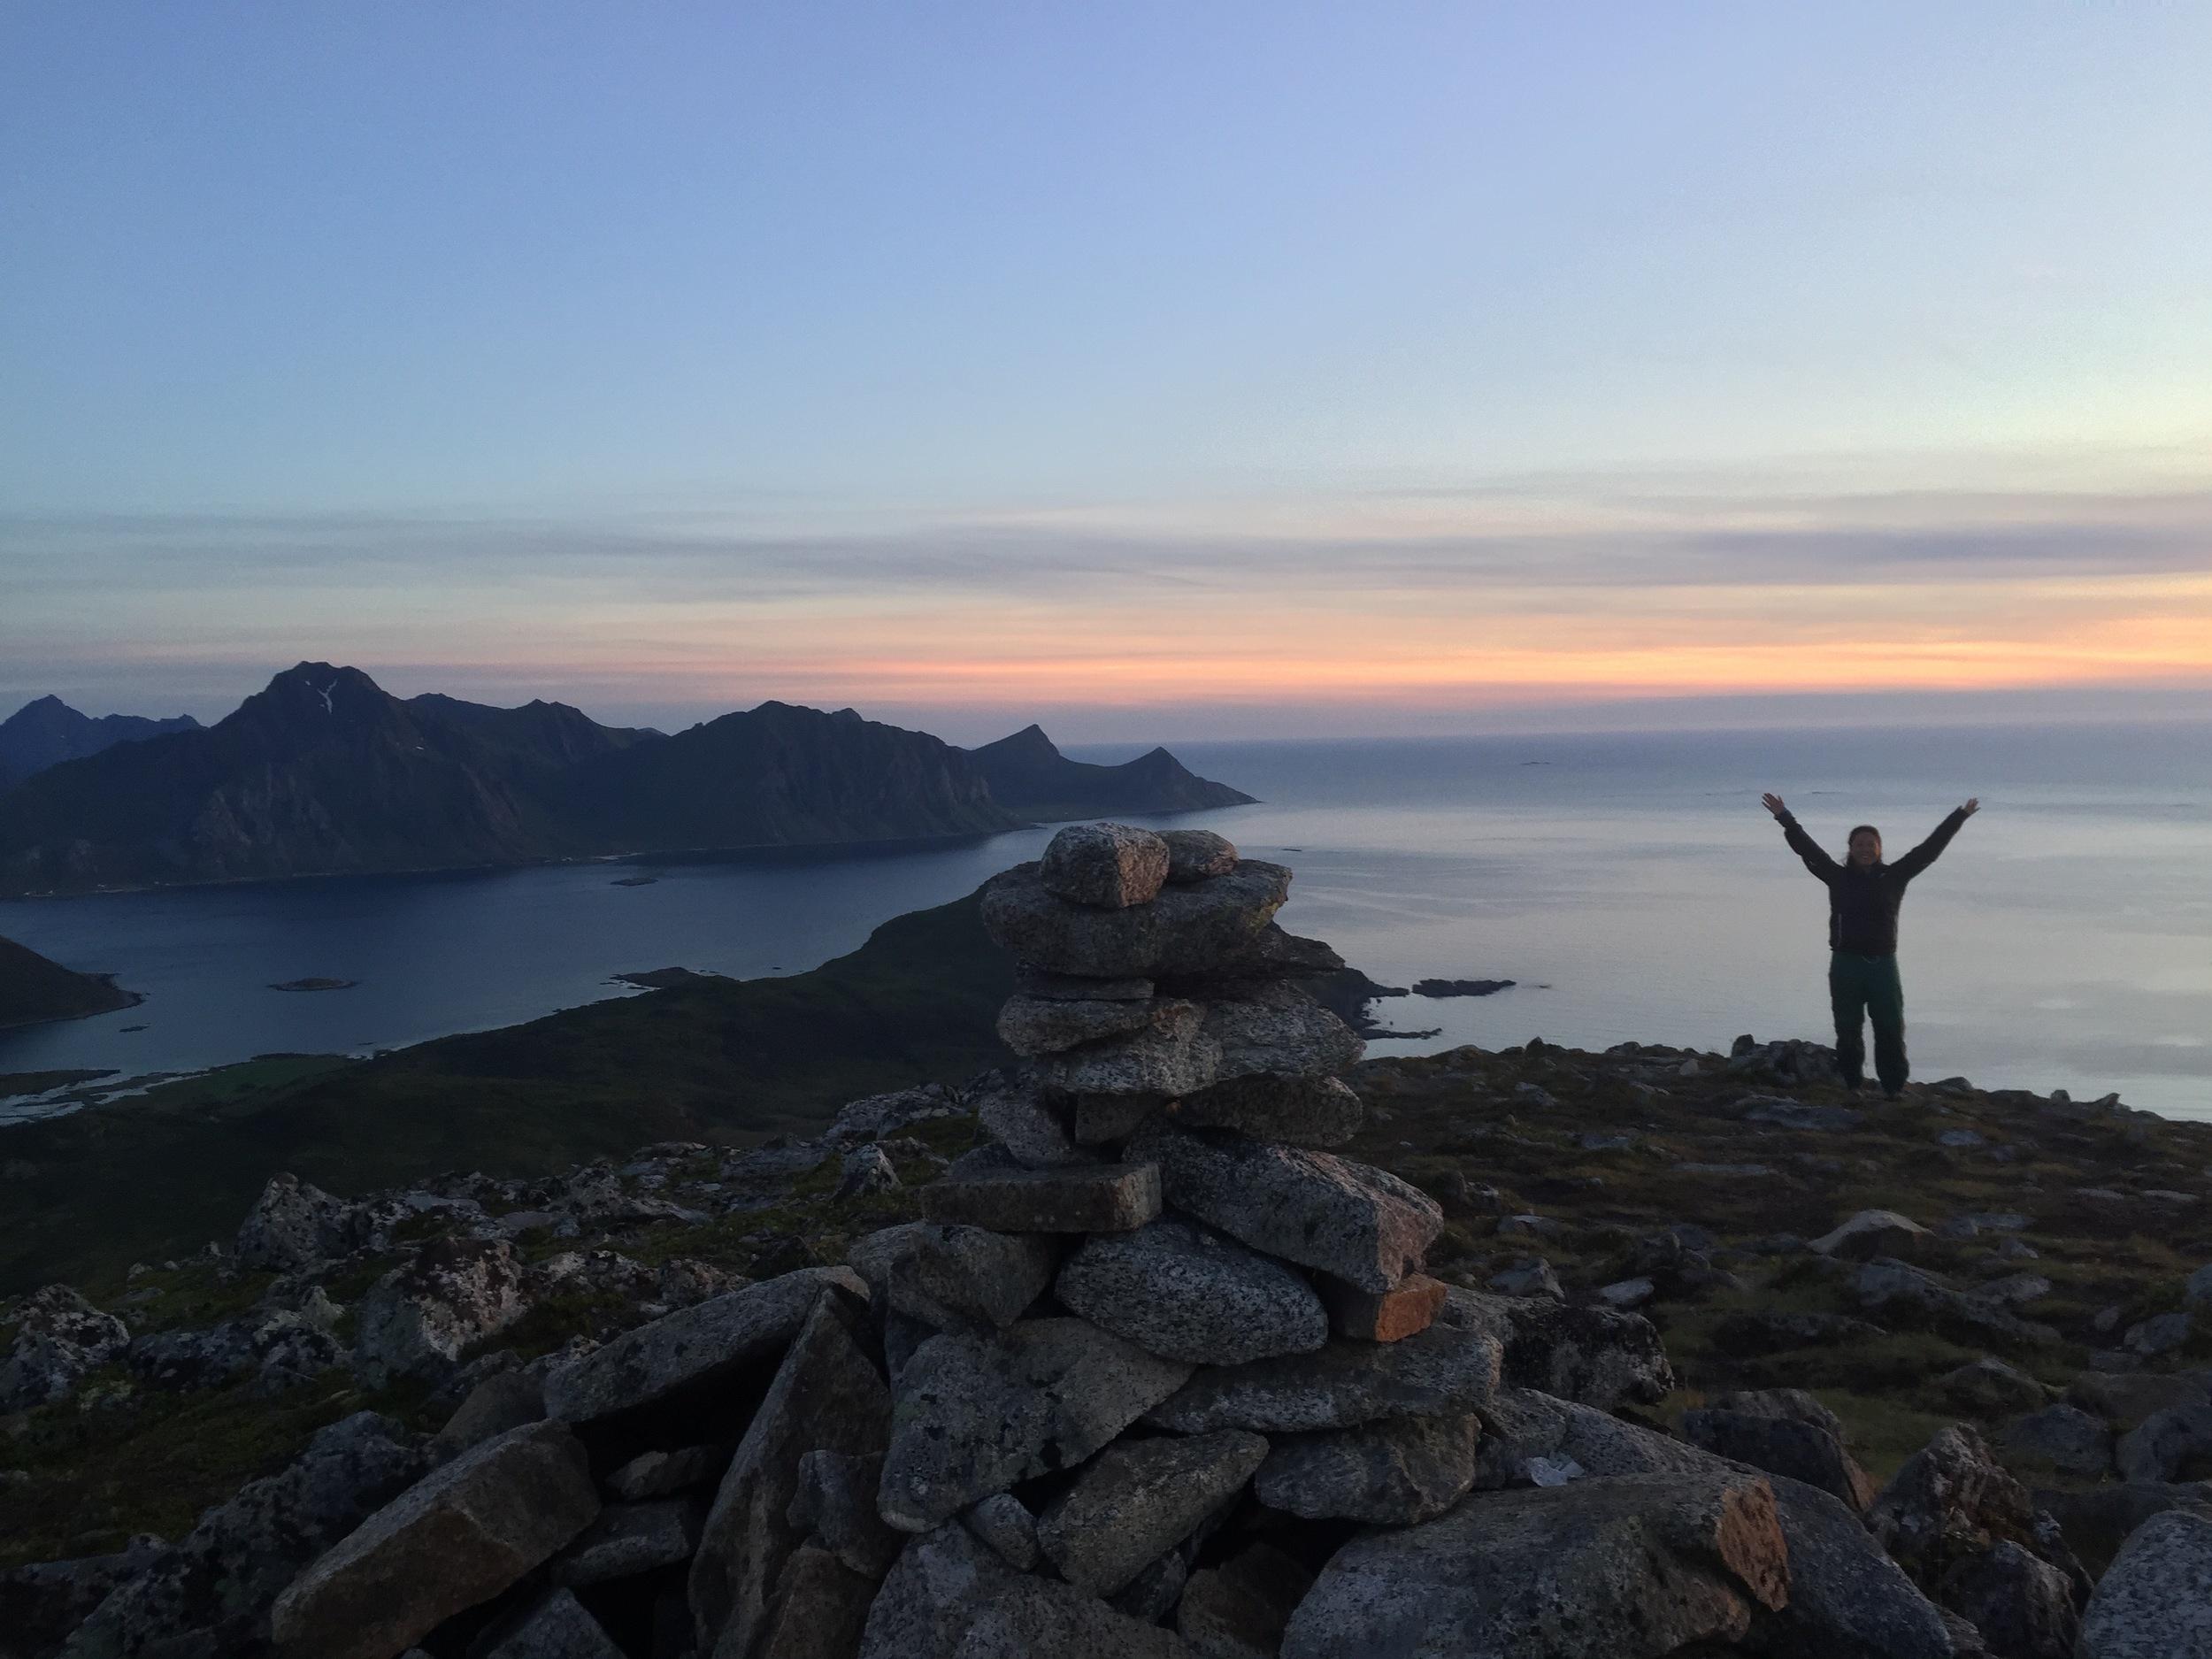 Great sunset in the Lofoten Islands!